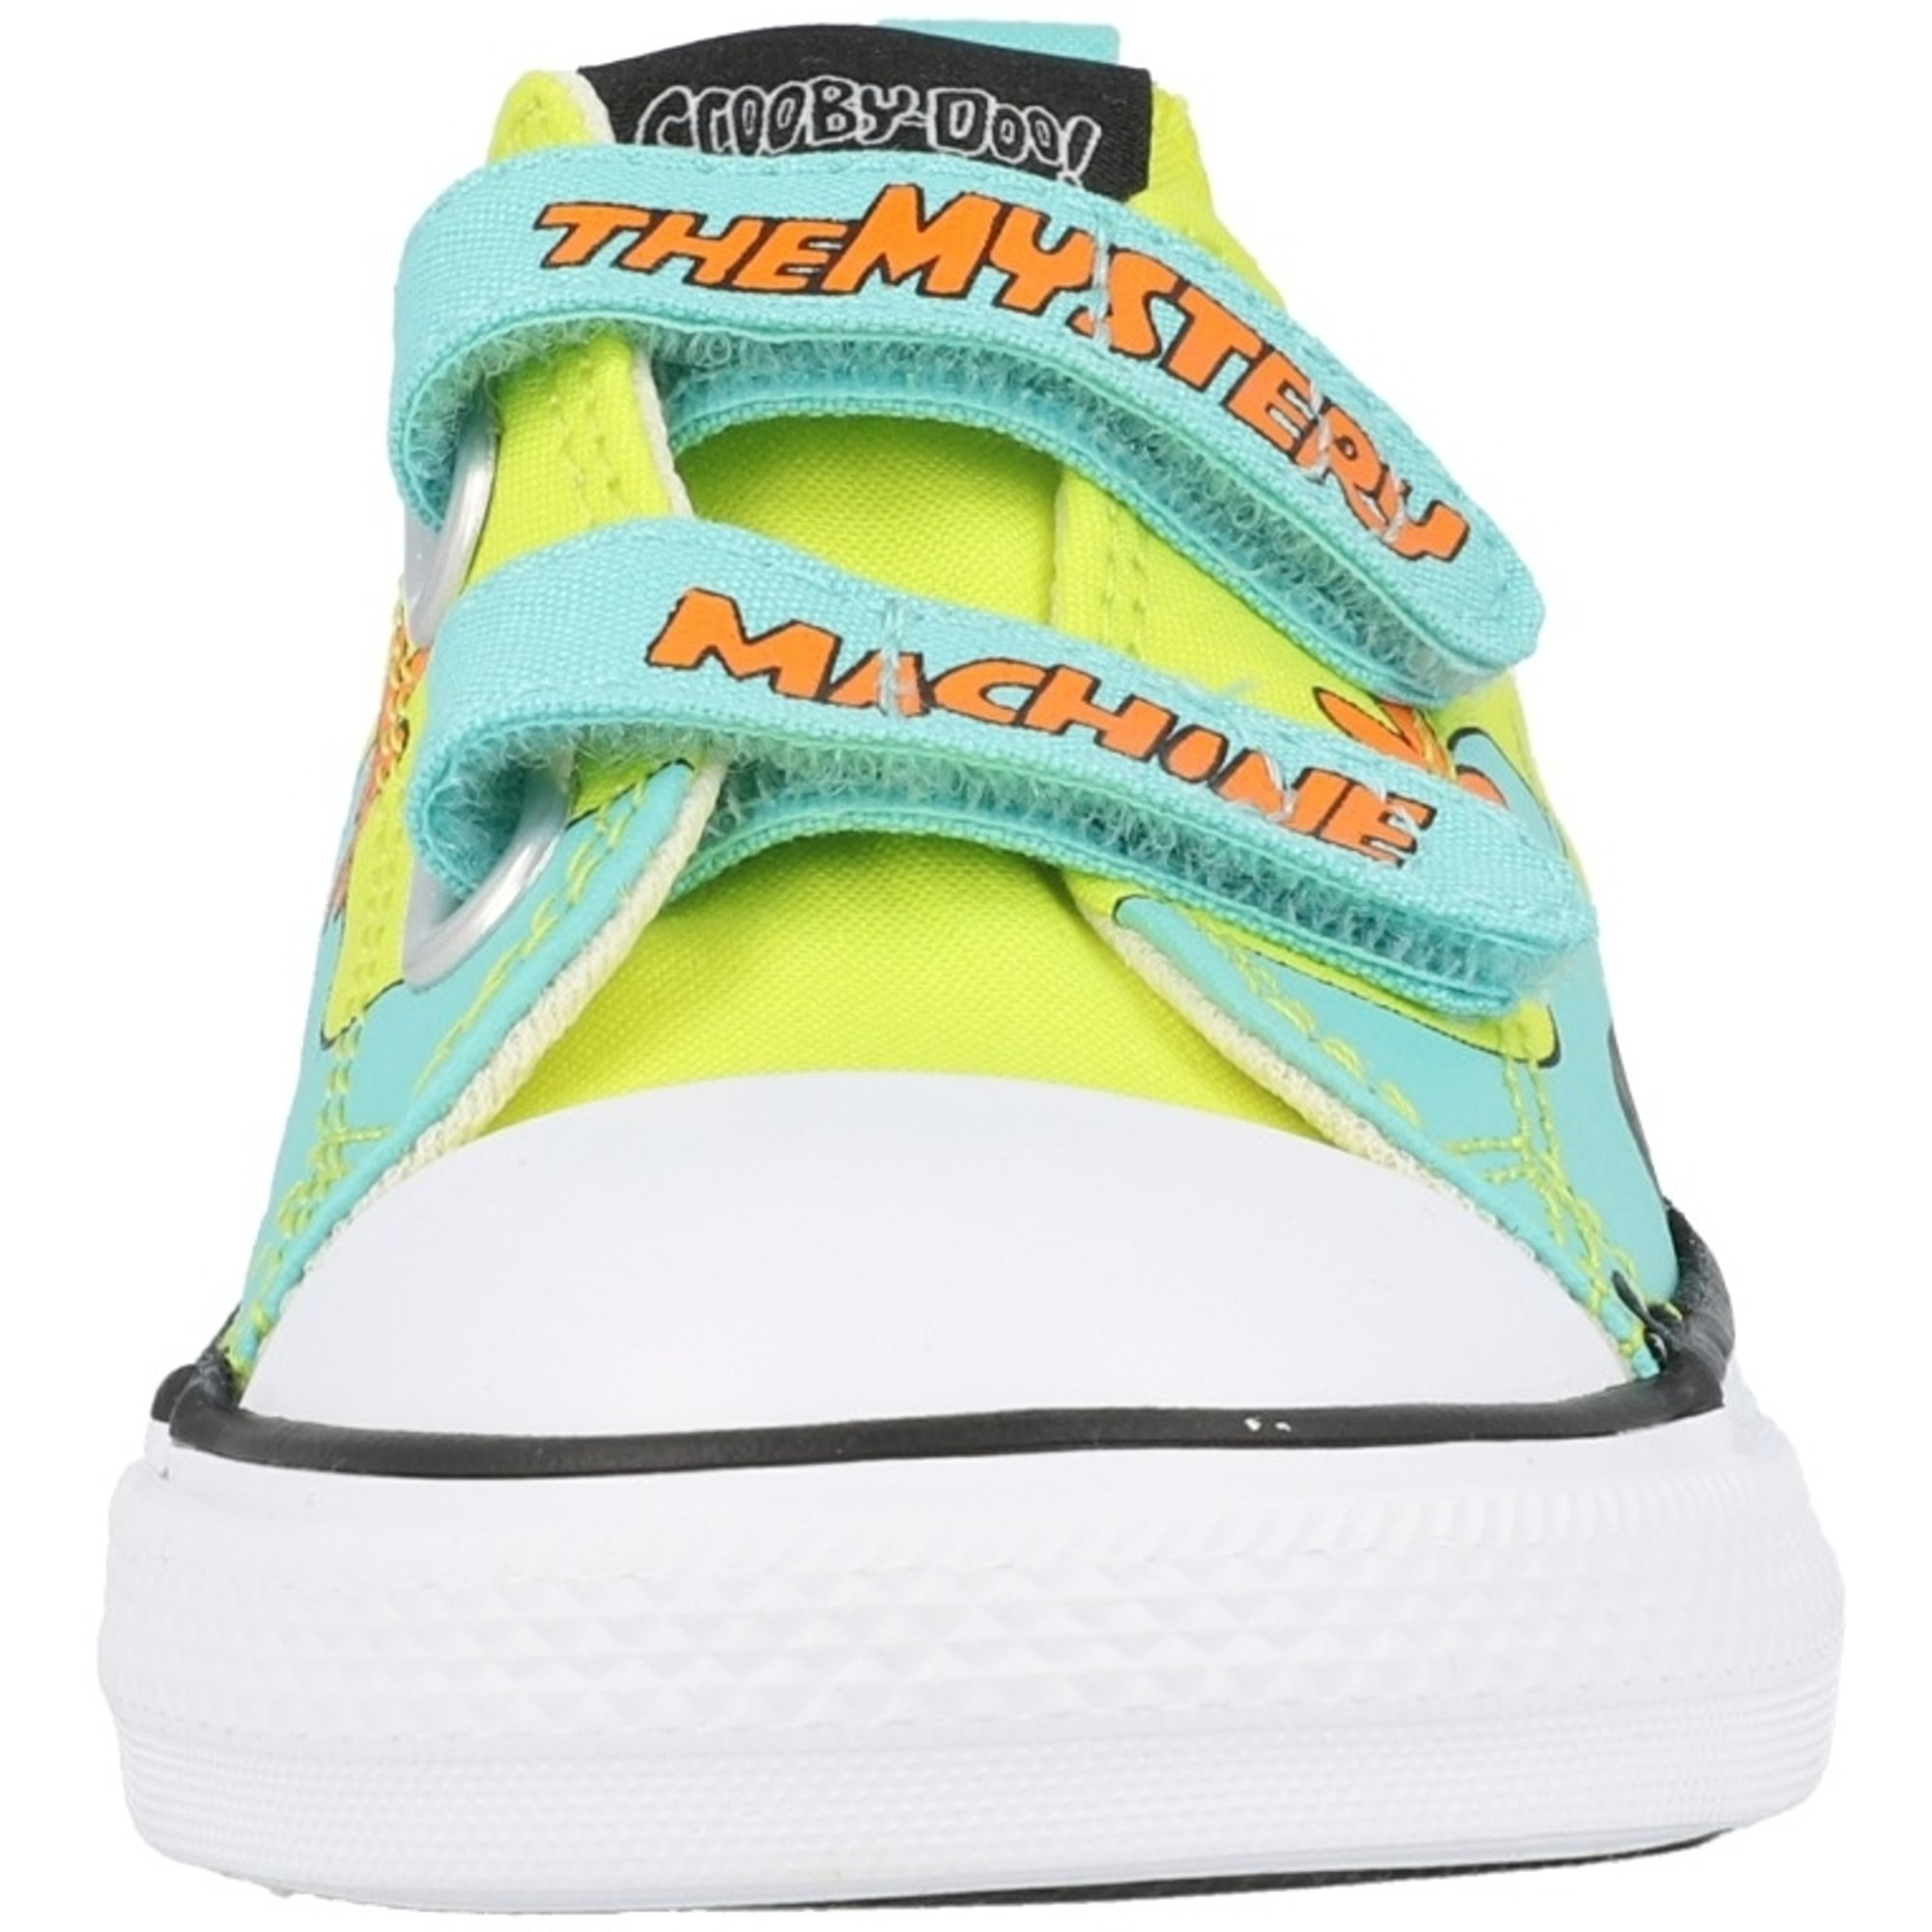 Converse Chuck Taylor All Star 2V Ox Scooby Doo Blue/Green Cotton